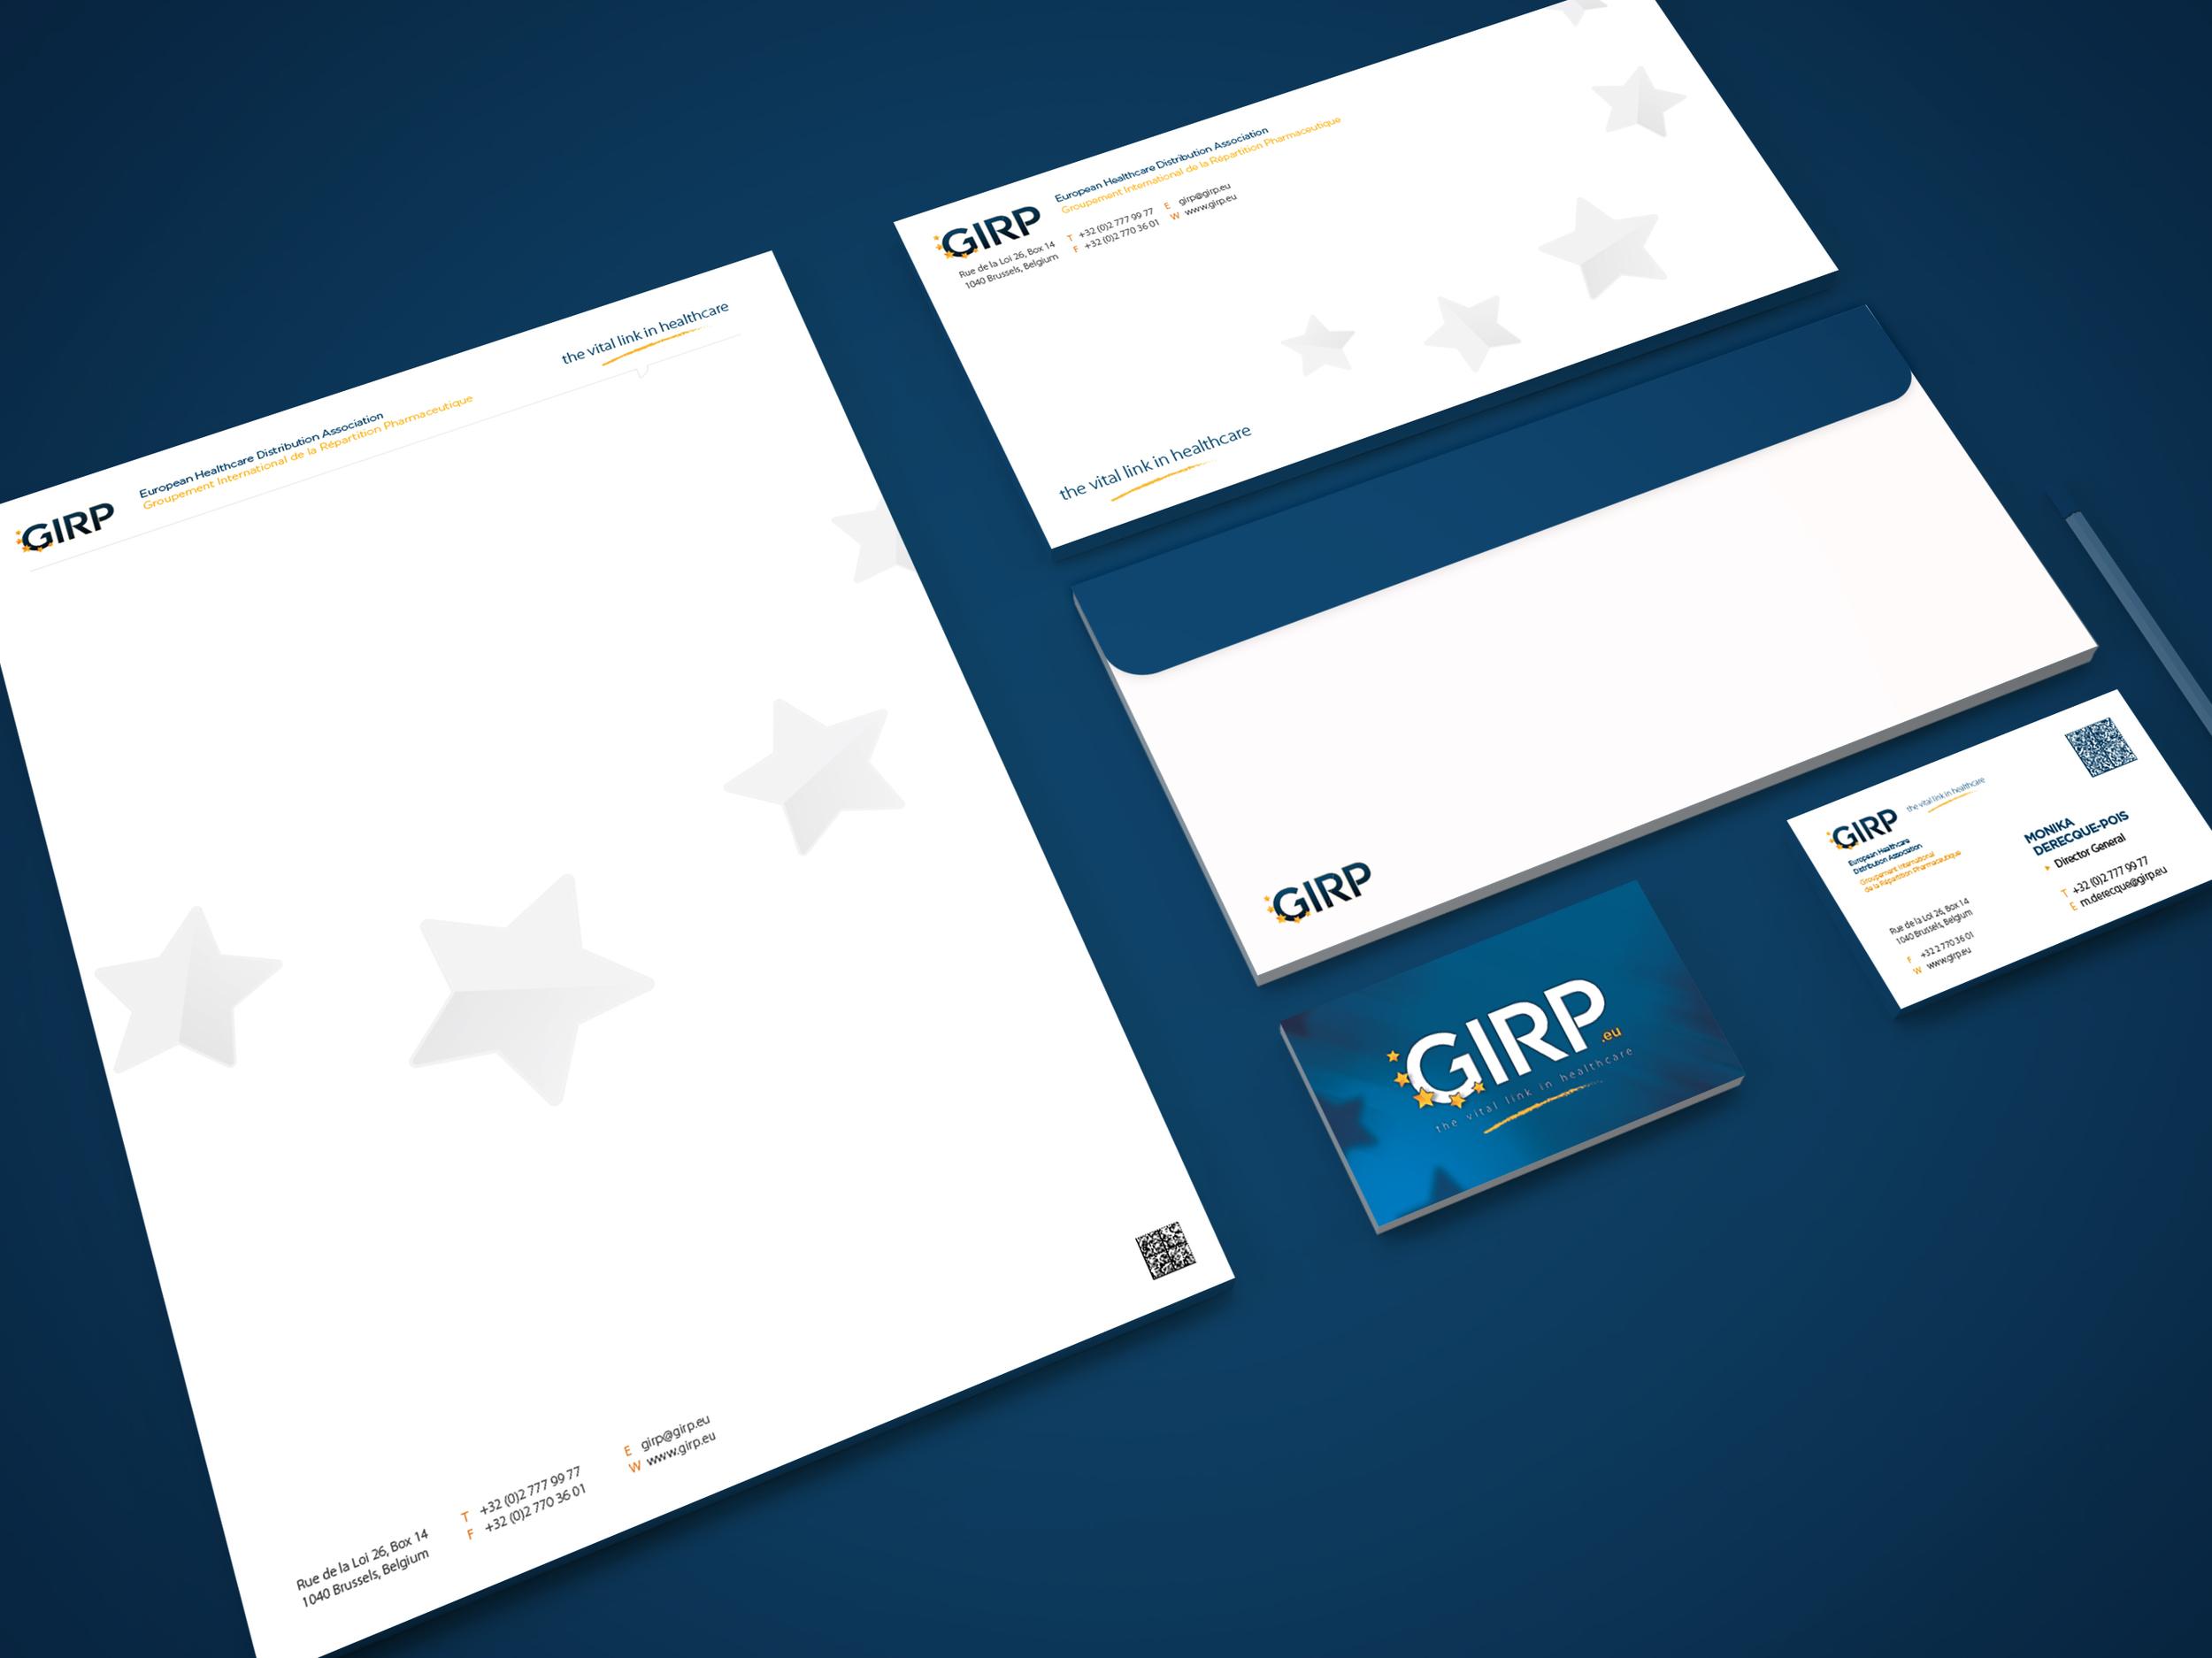 02. GIRP - stationary.jpg